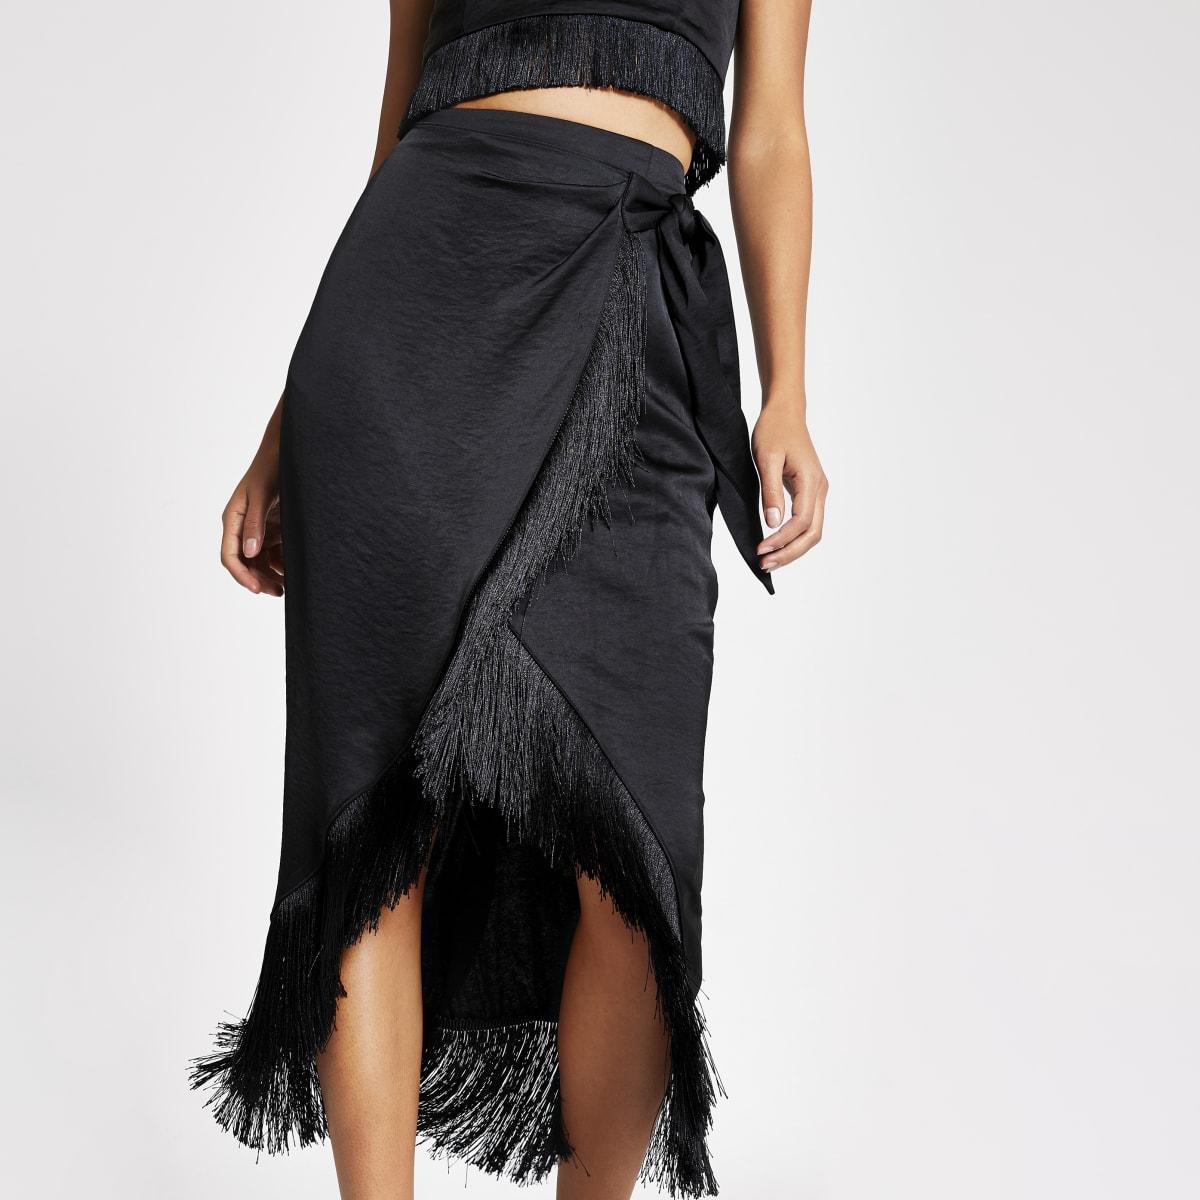 Zwarte satijnen midi-jurk met overslag en franje